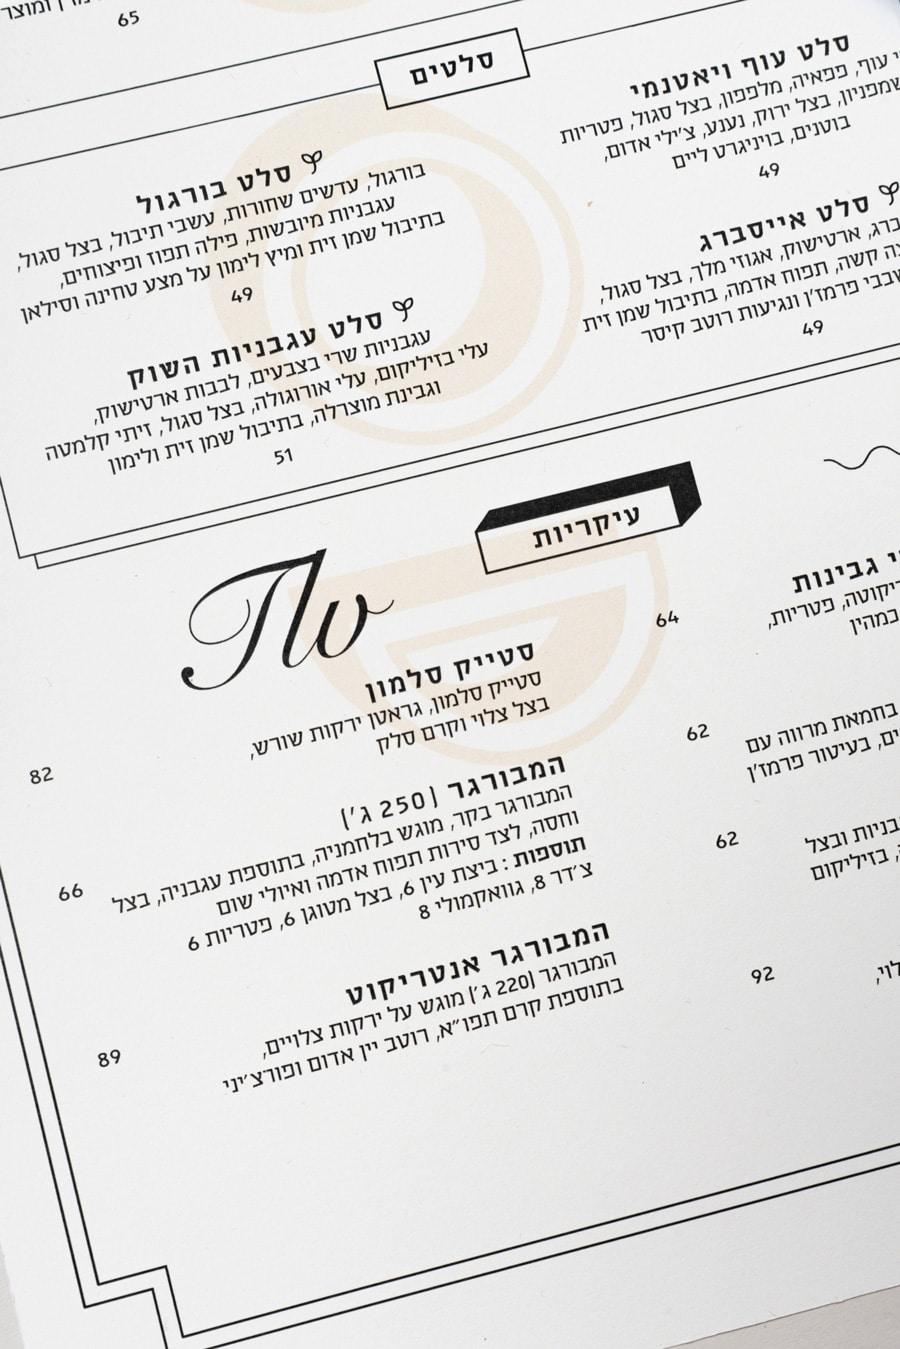 h2o pure design business design zappa menu